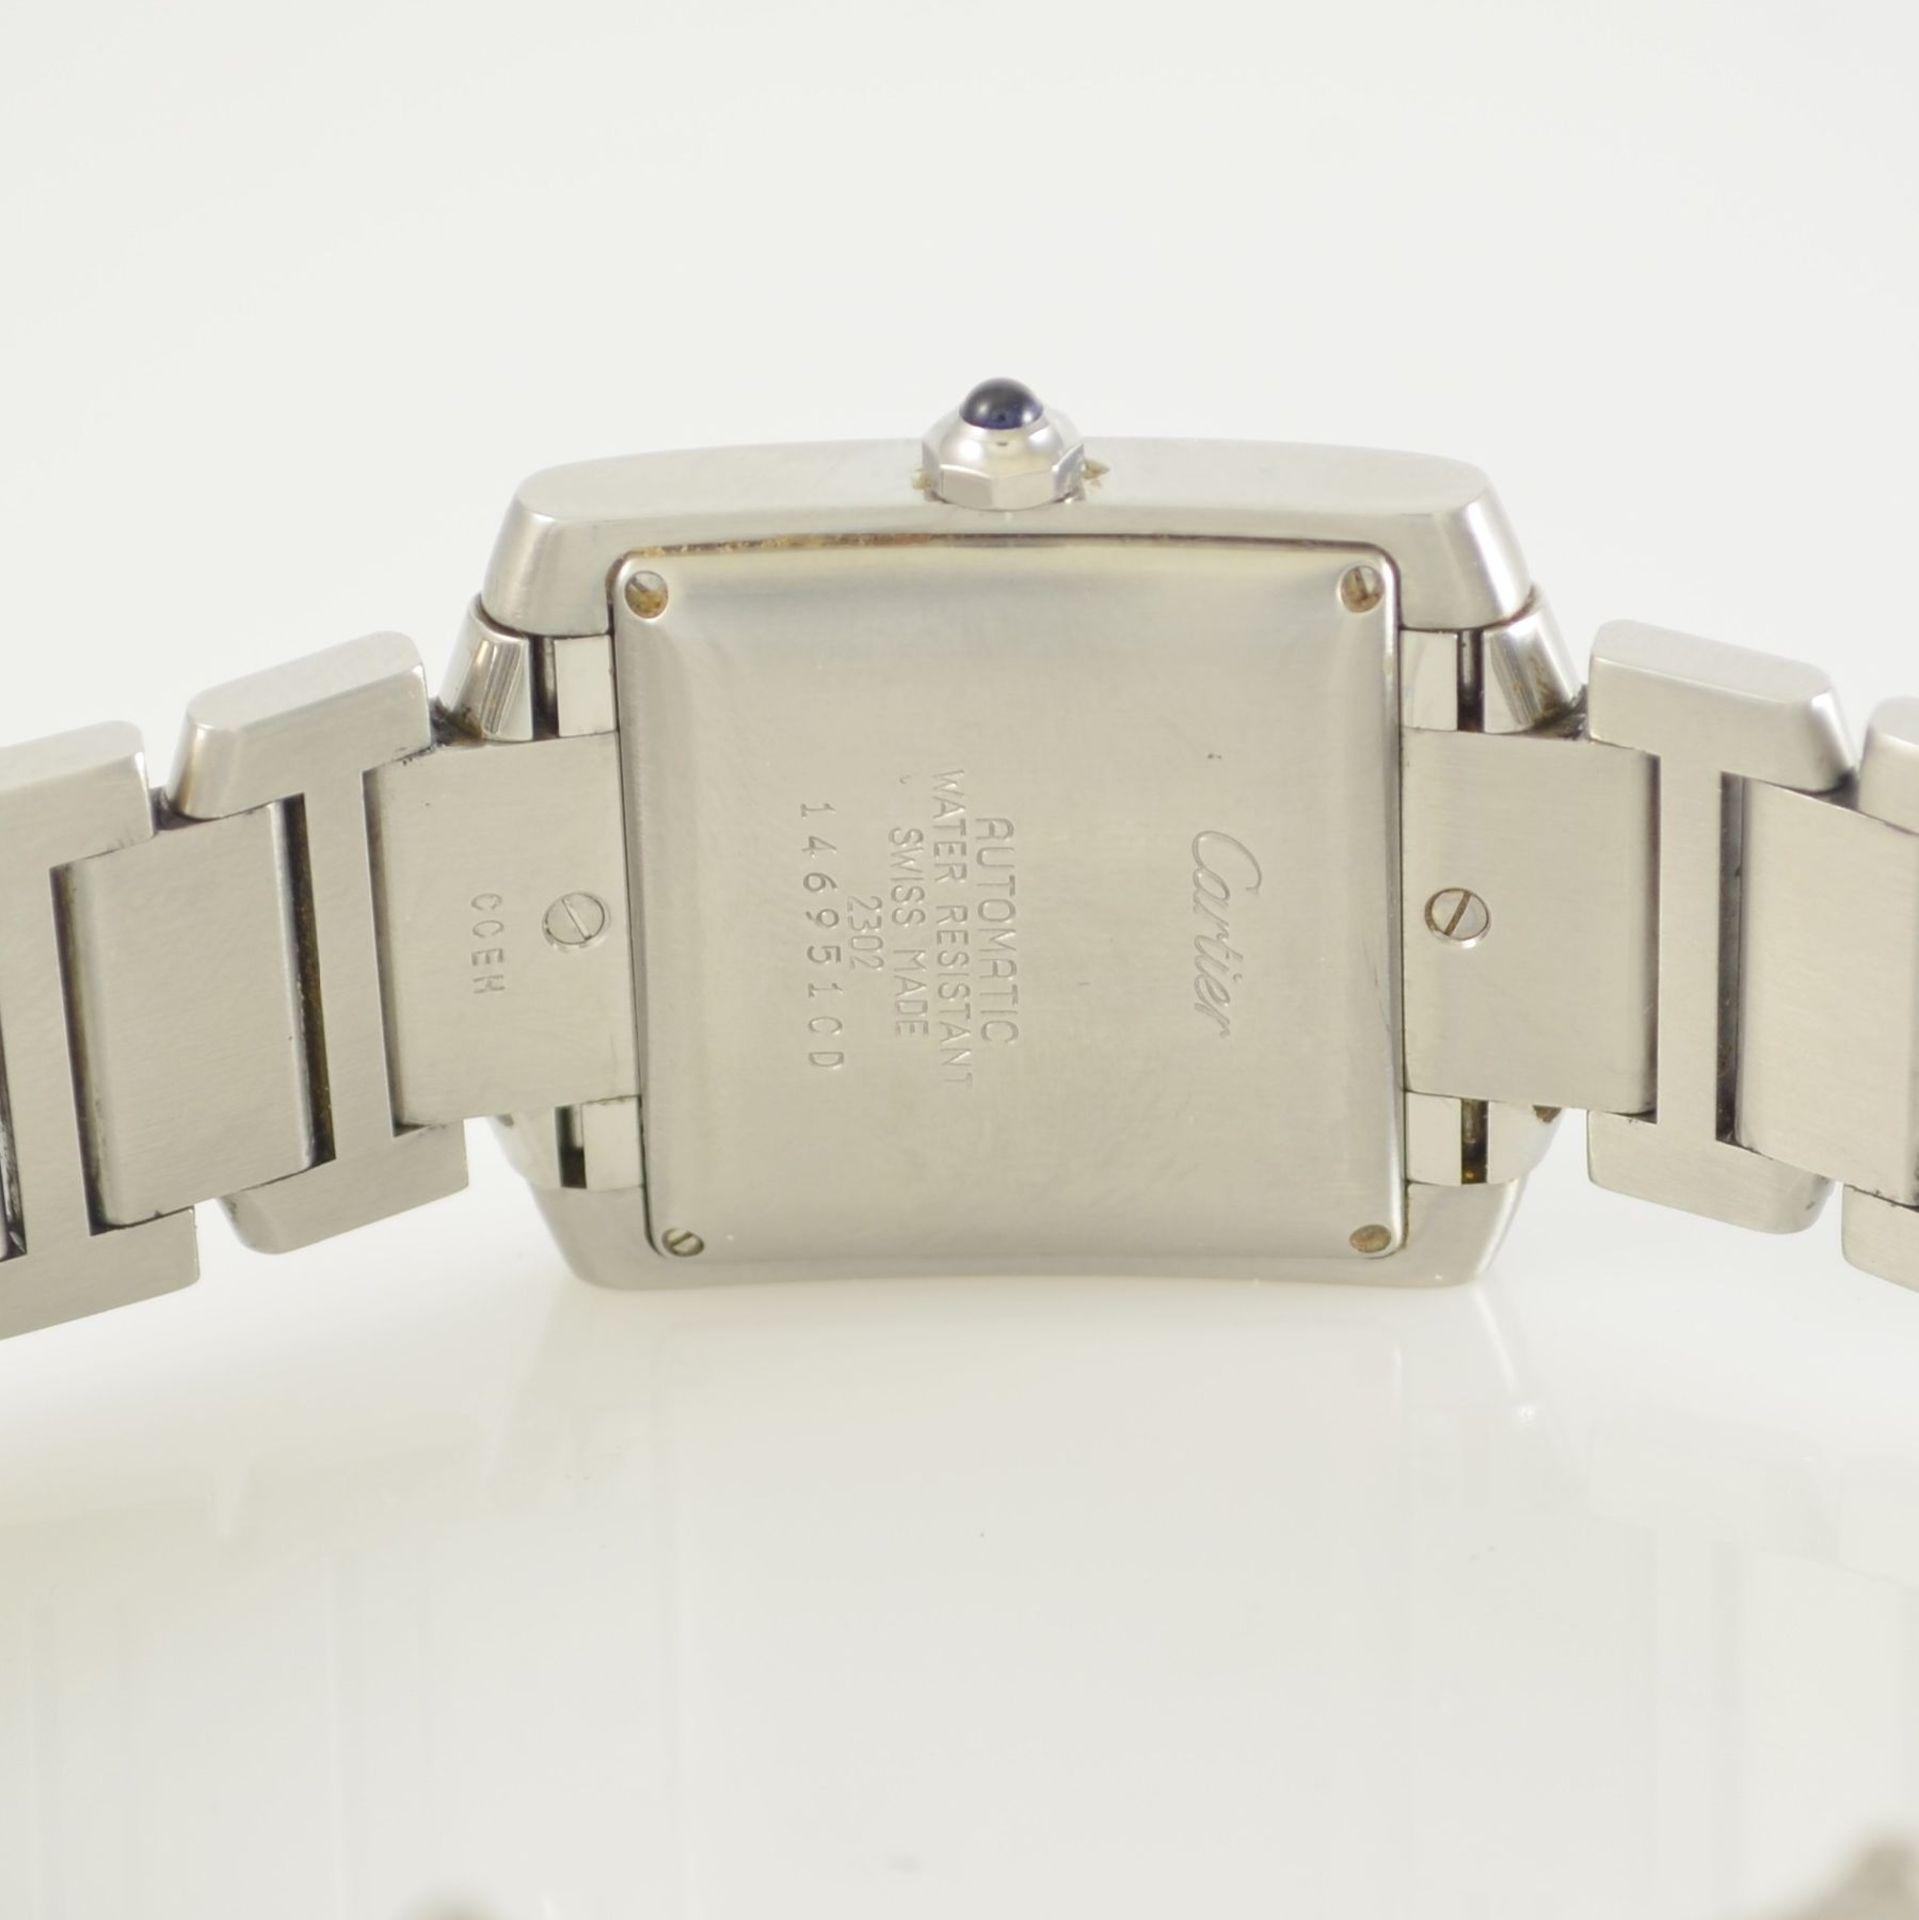 CARTIER Armbanduhr Tank Francaise, Automatik, Ref. 2302, Edelstahlgeh. inkl. Gliederband m. dopp. - Bild 7 aus 8